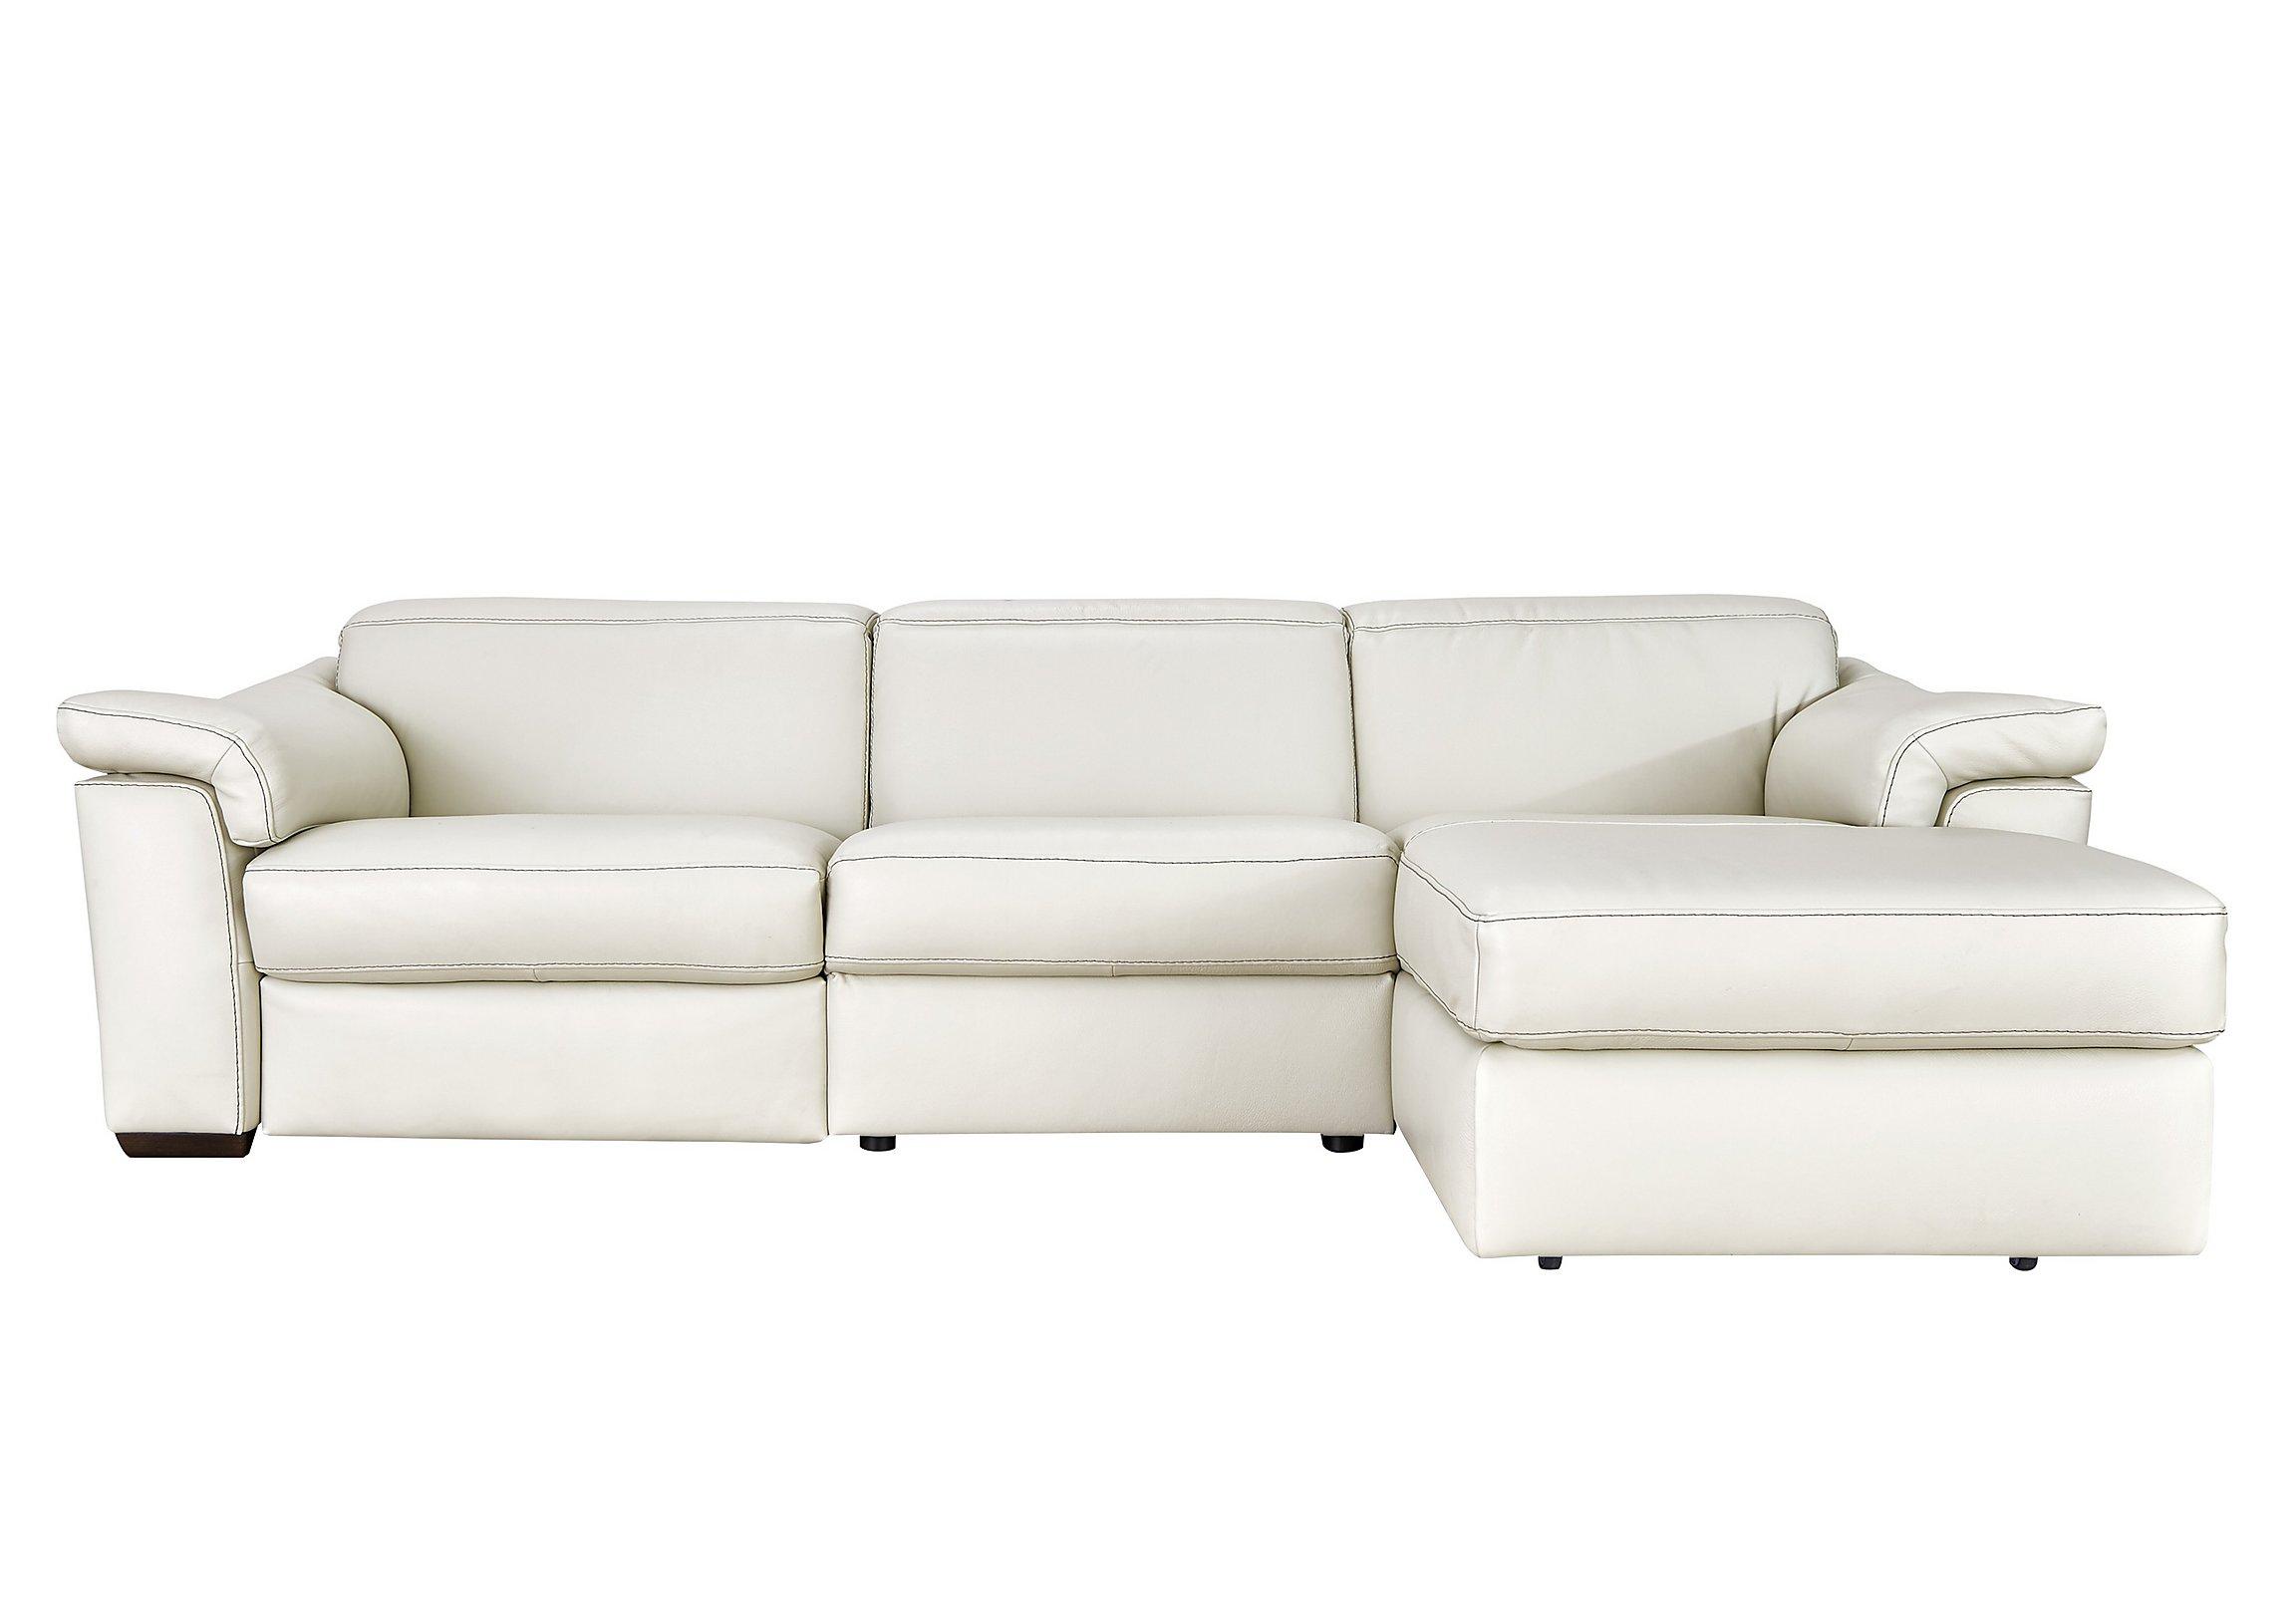 white w furniture leather seater zoom h right editions sofa recliner natuzzi dream no sensor left